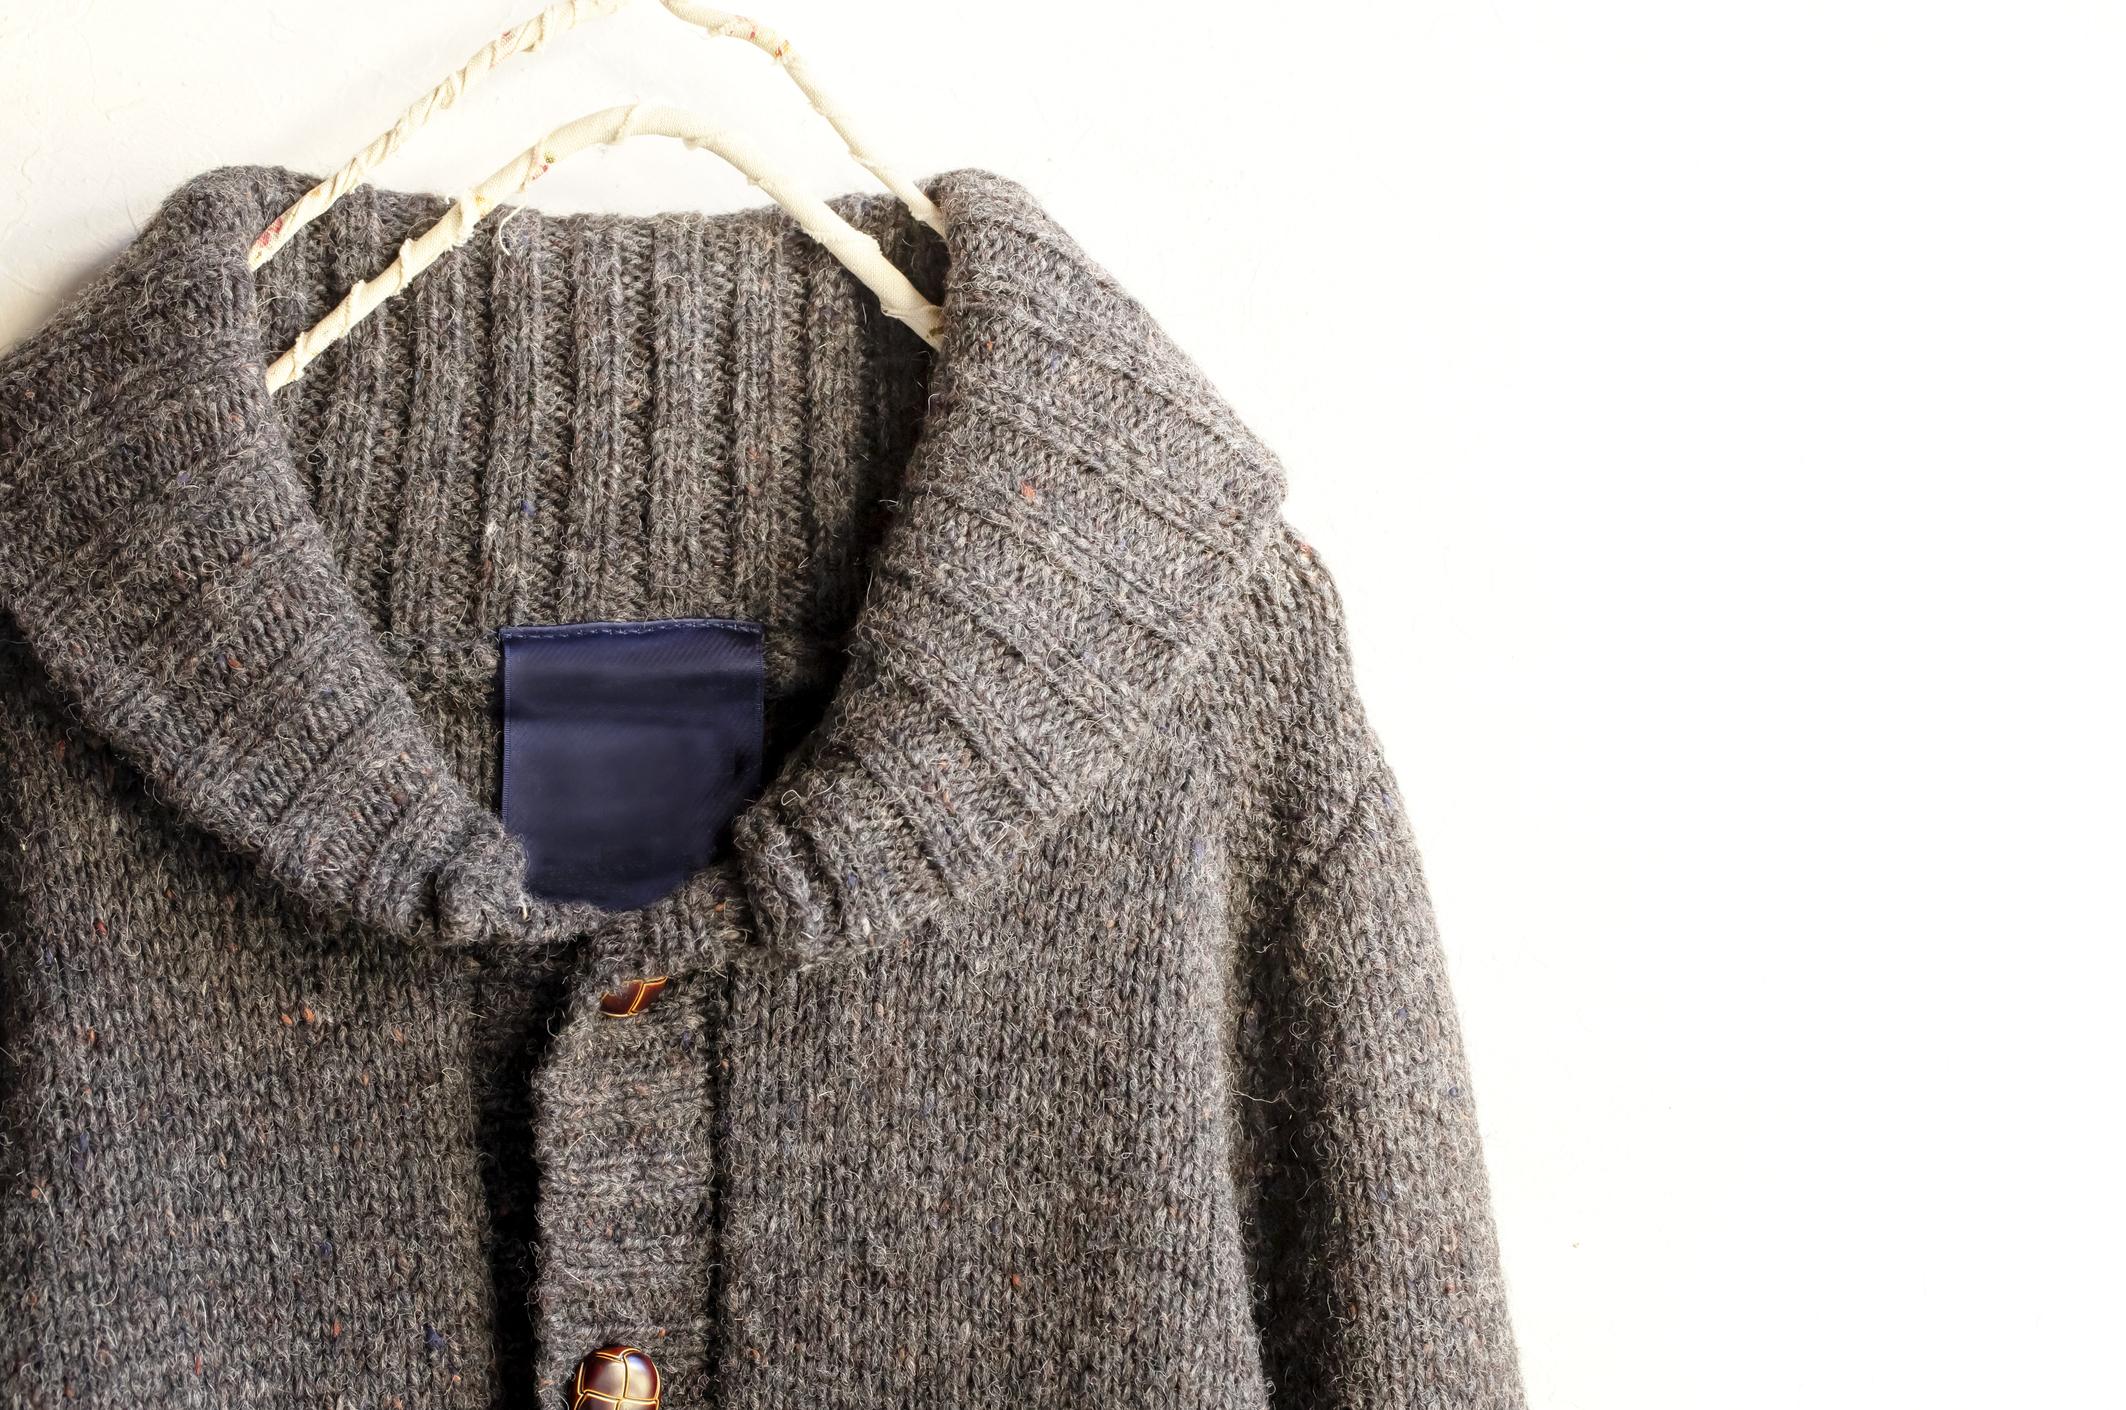 wool coat on a coat hanger